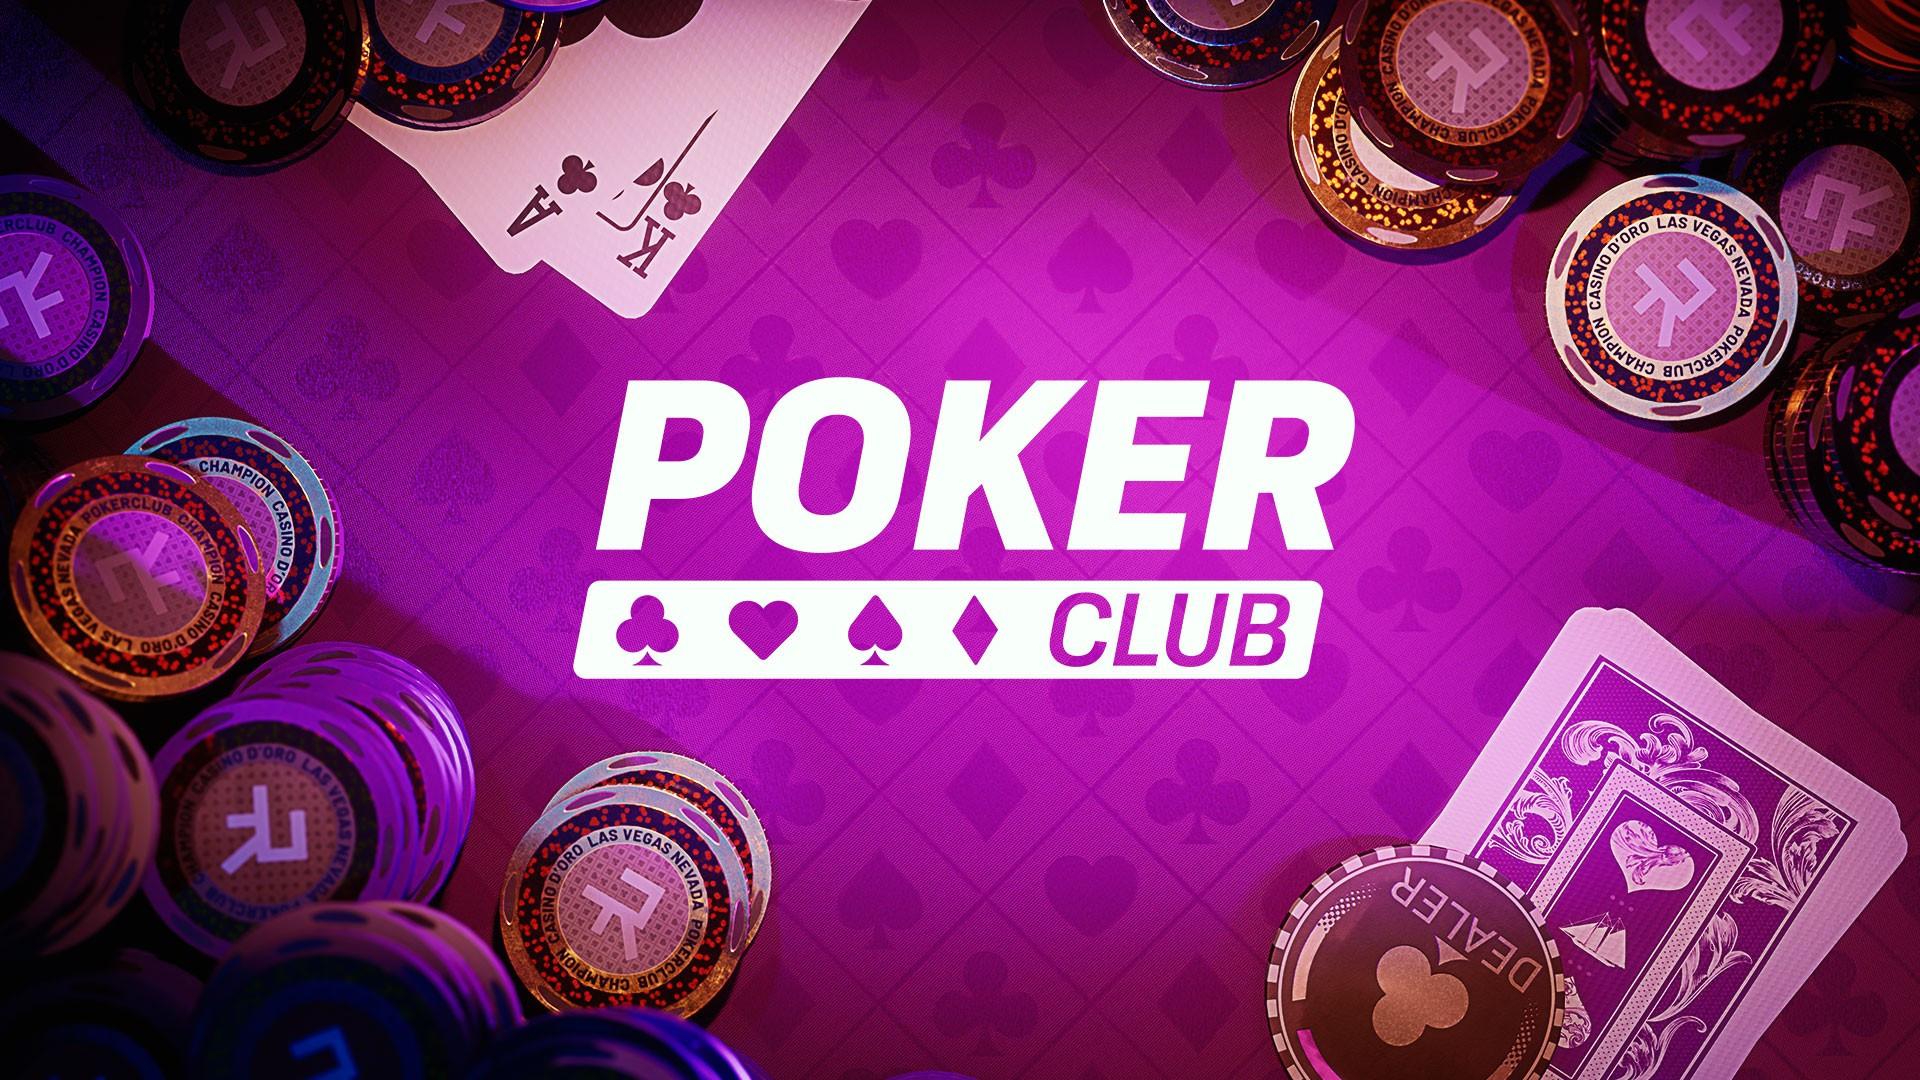 poker club video game wallpaper 72506